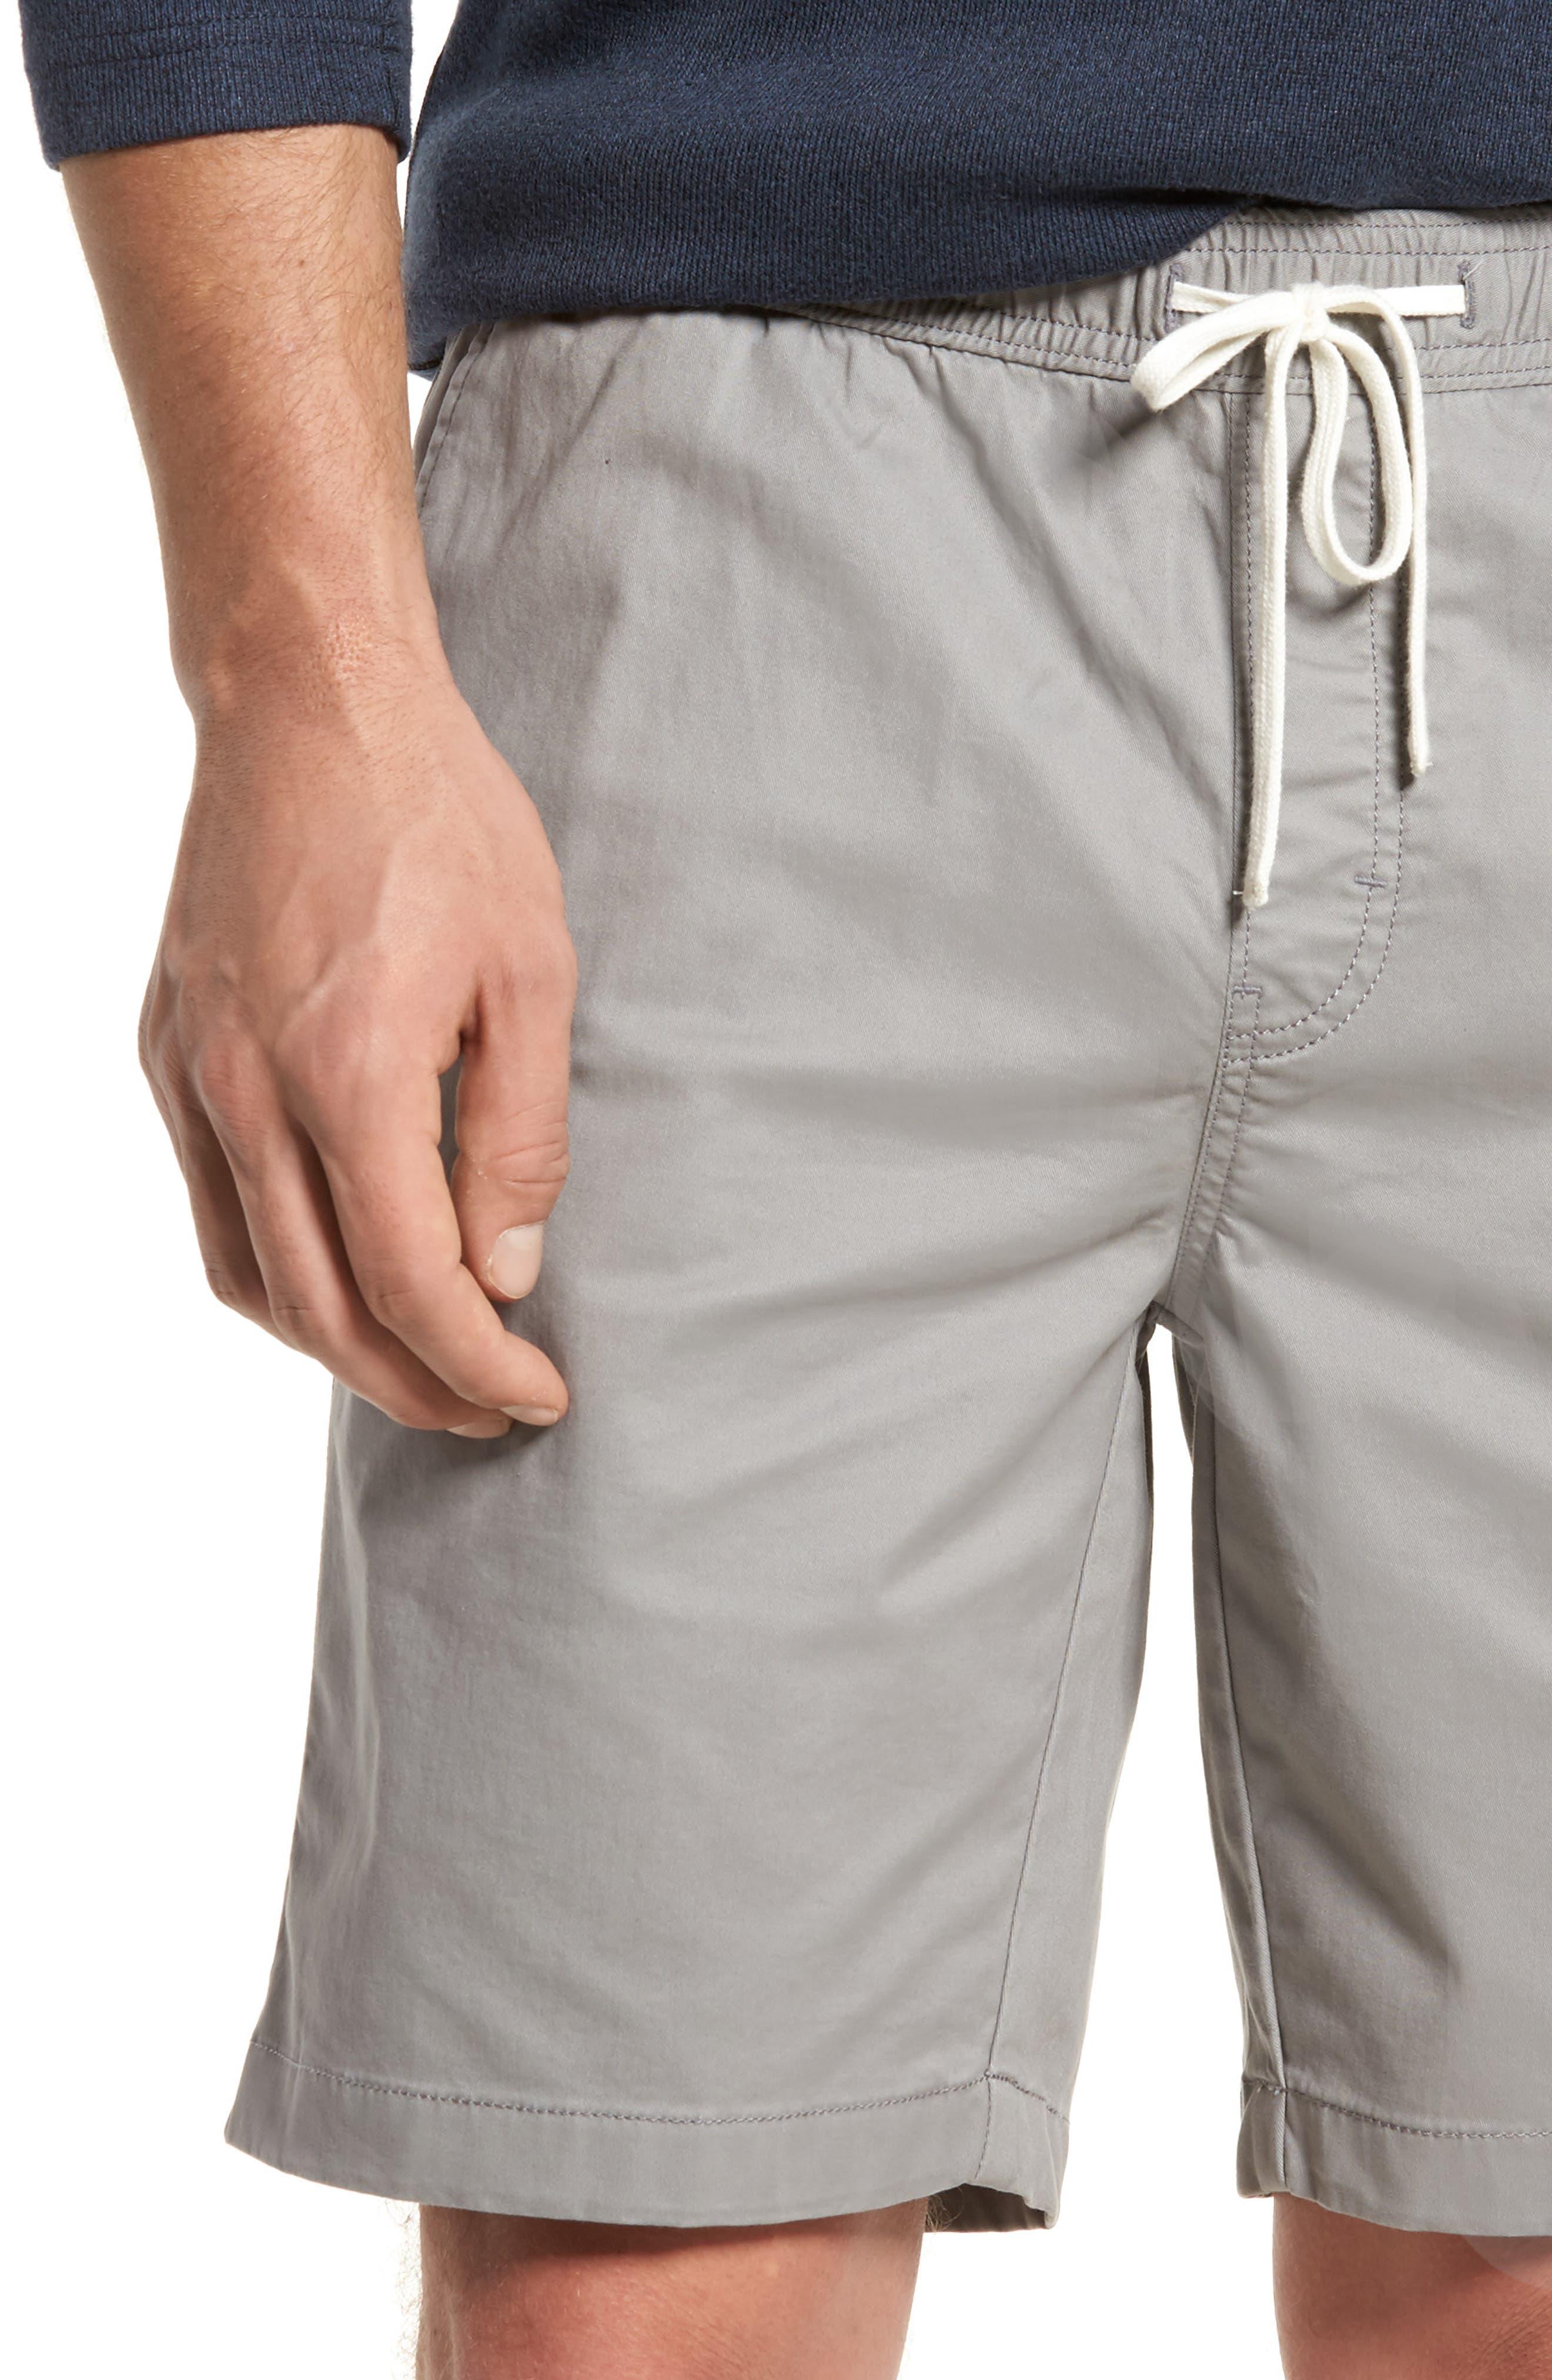 Ballard Slim Fit Shorts,                             Alternate thumbnail 4, color,                             030